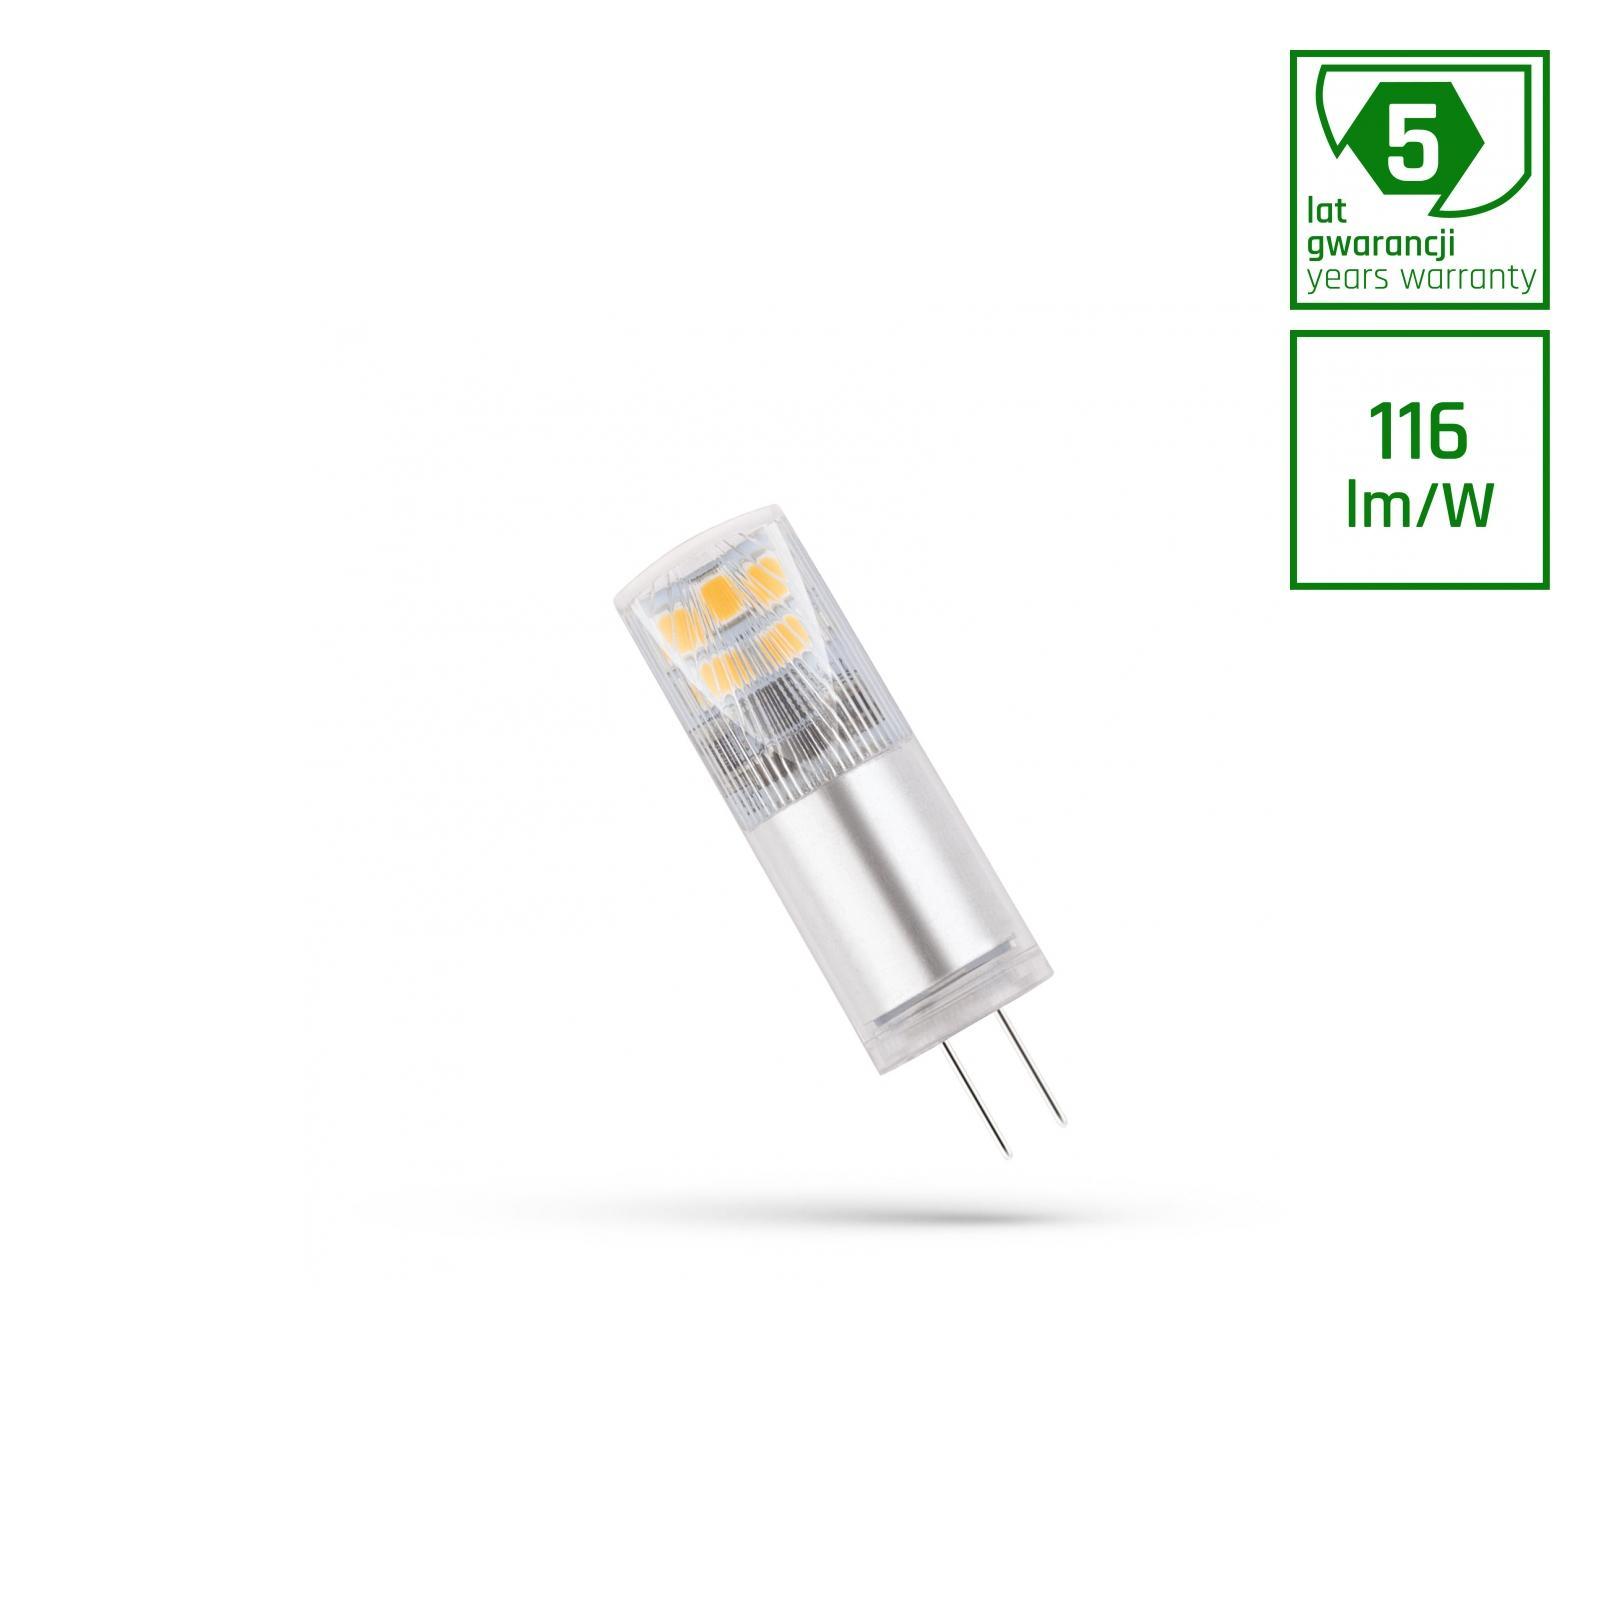 LED G4 12V 2,5W Studená bílá bíllá 5 LAT PREMIUM SPECTRUM